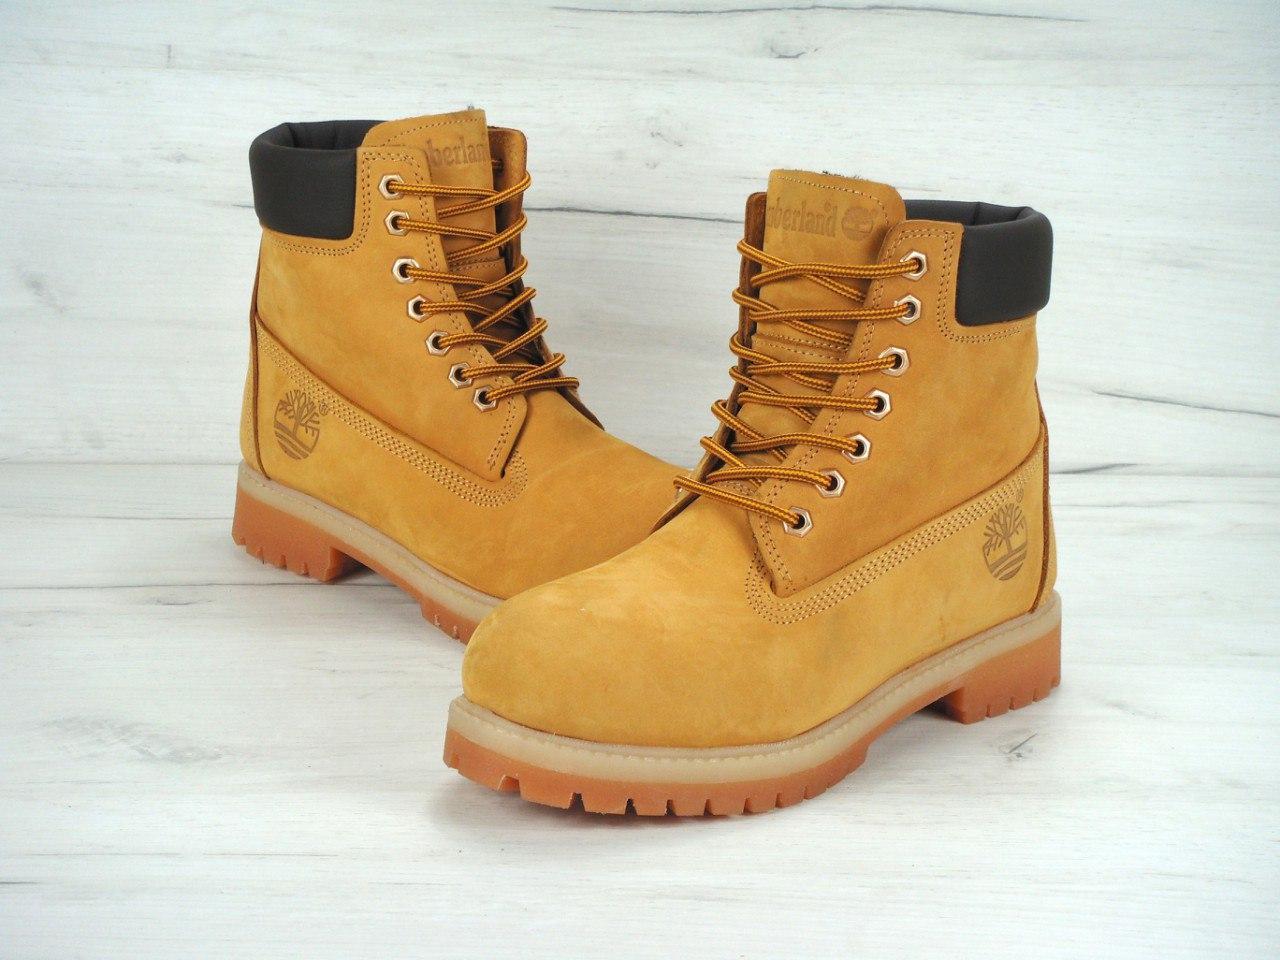 c1485cae2259 Женские ботинки Timberland 6 Inch Premium Waterproof Boots с мехом -  Shoezzy в Киеве